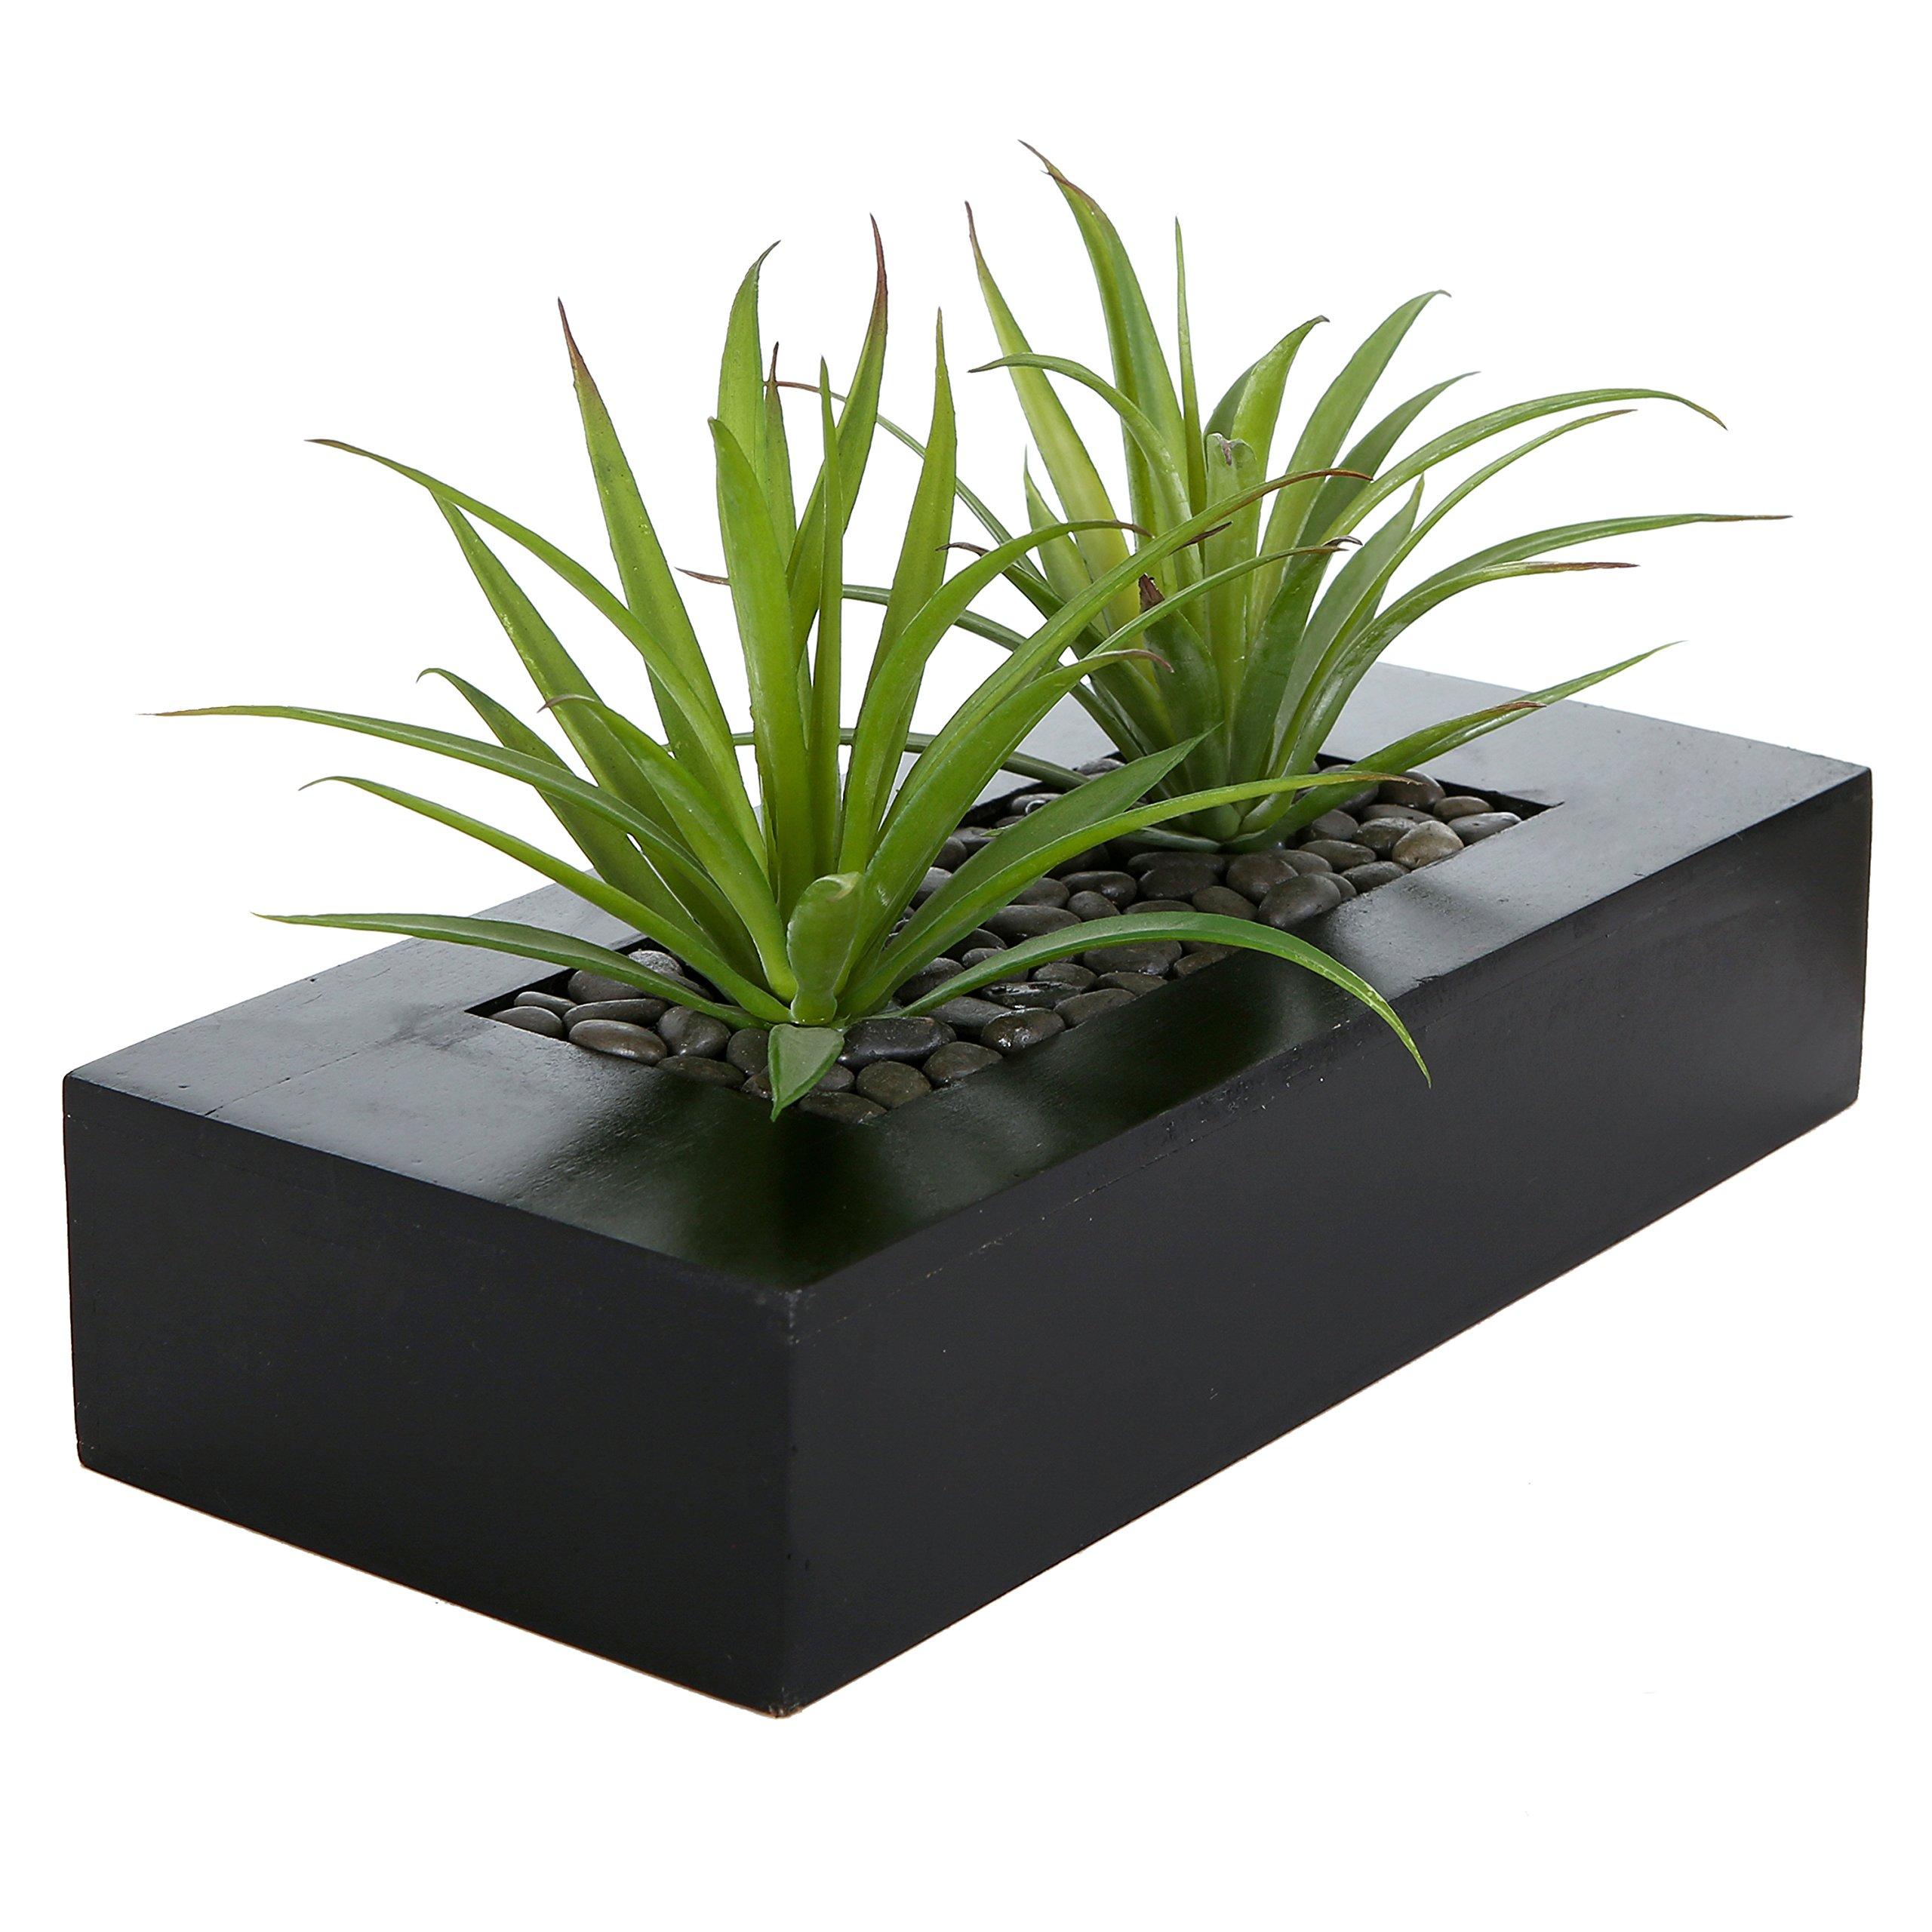 Artificial Green Grass Plants in Decorative Black Wood Rectangular Planter Pot